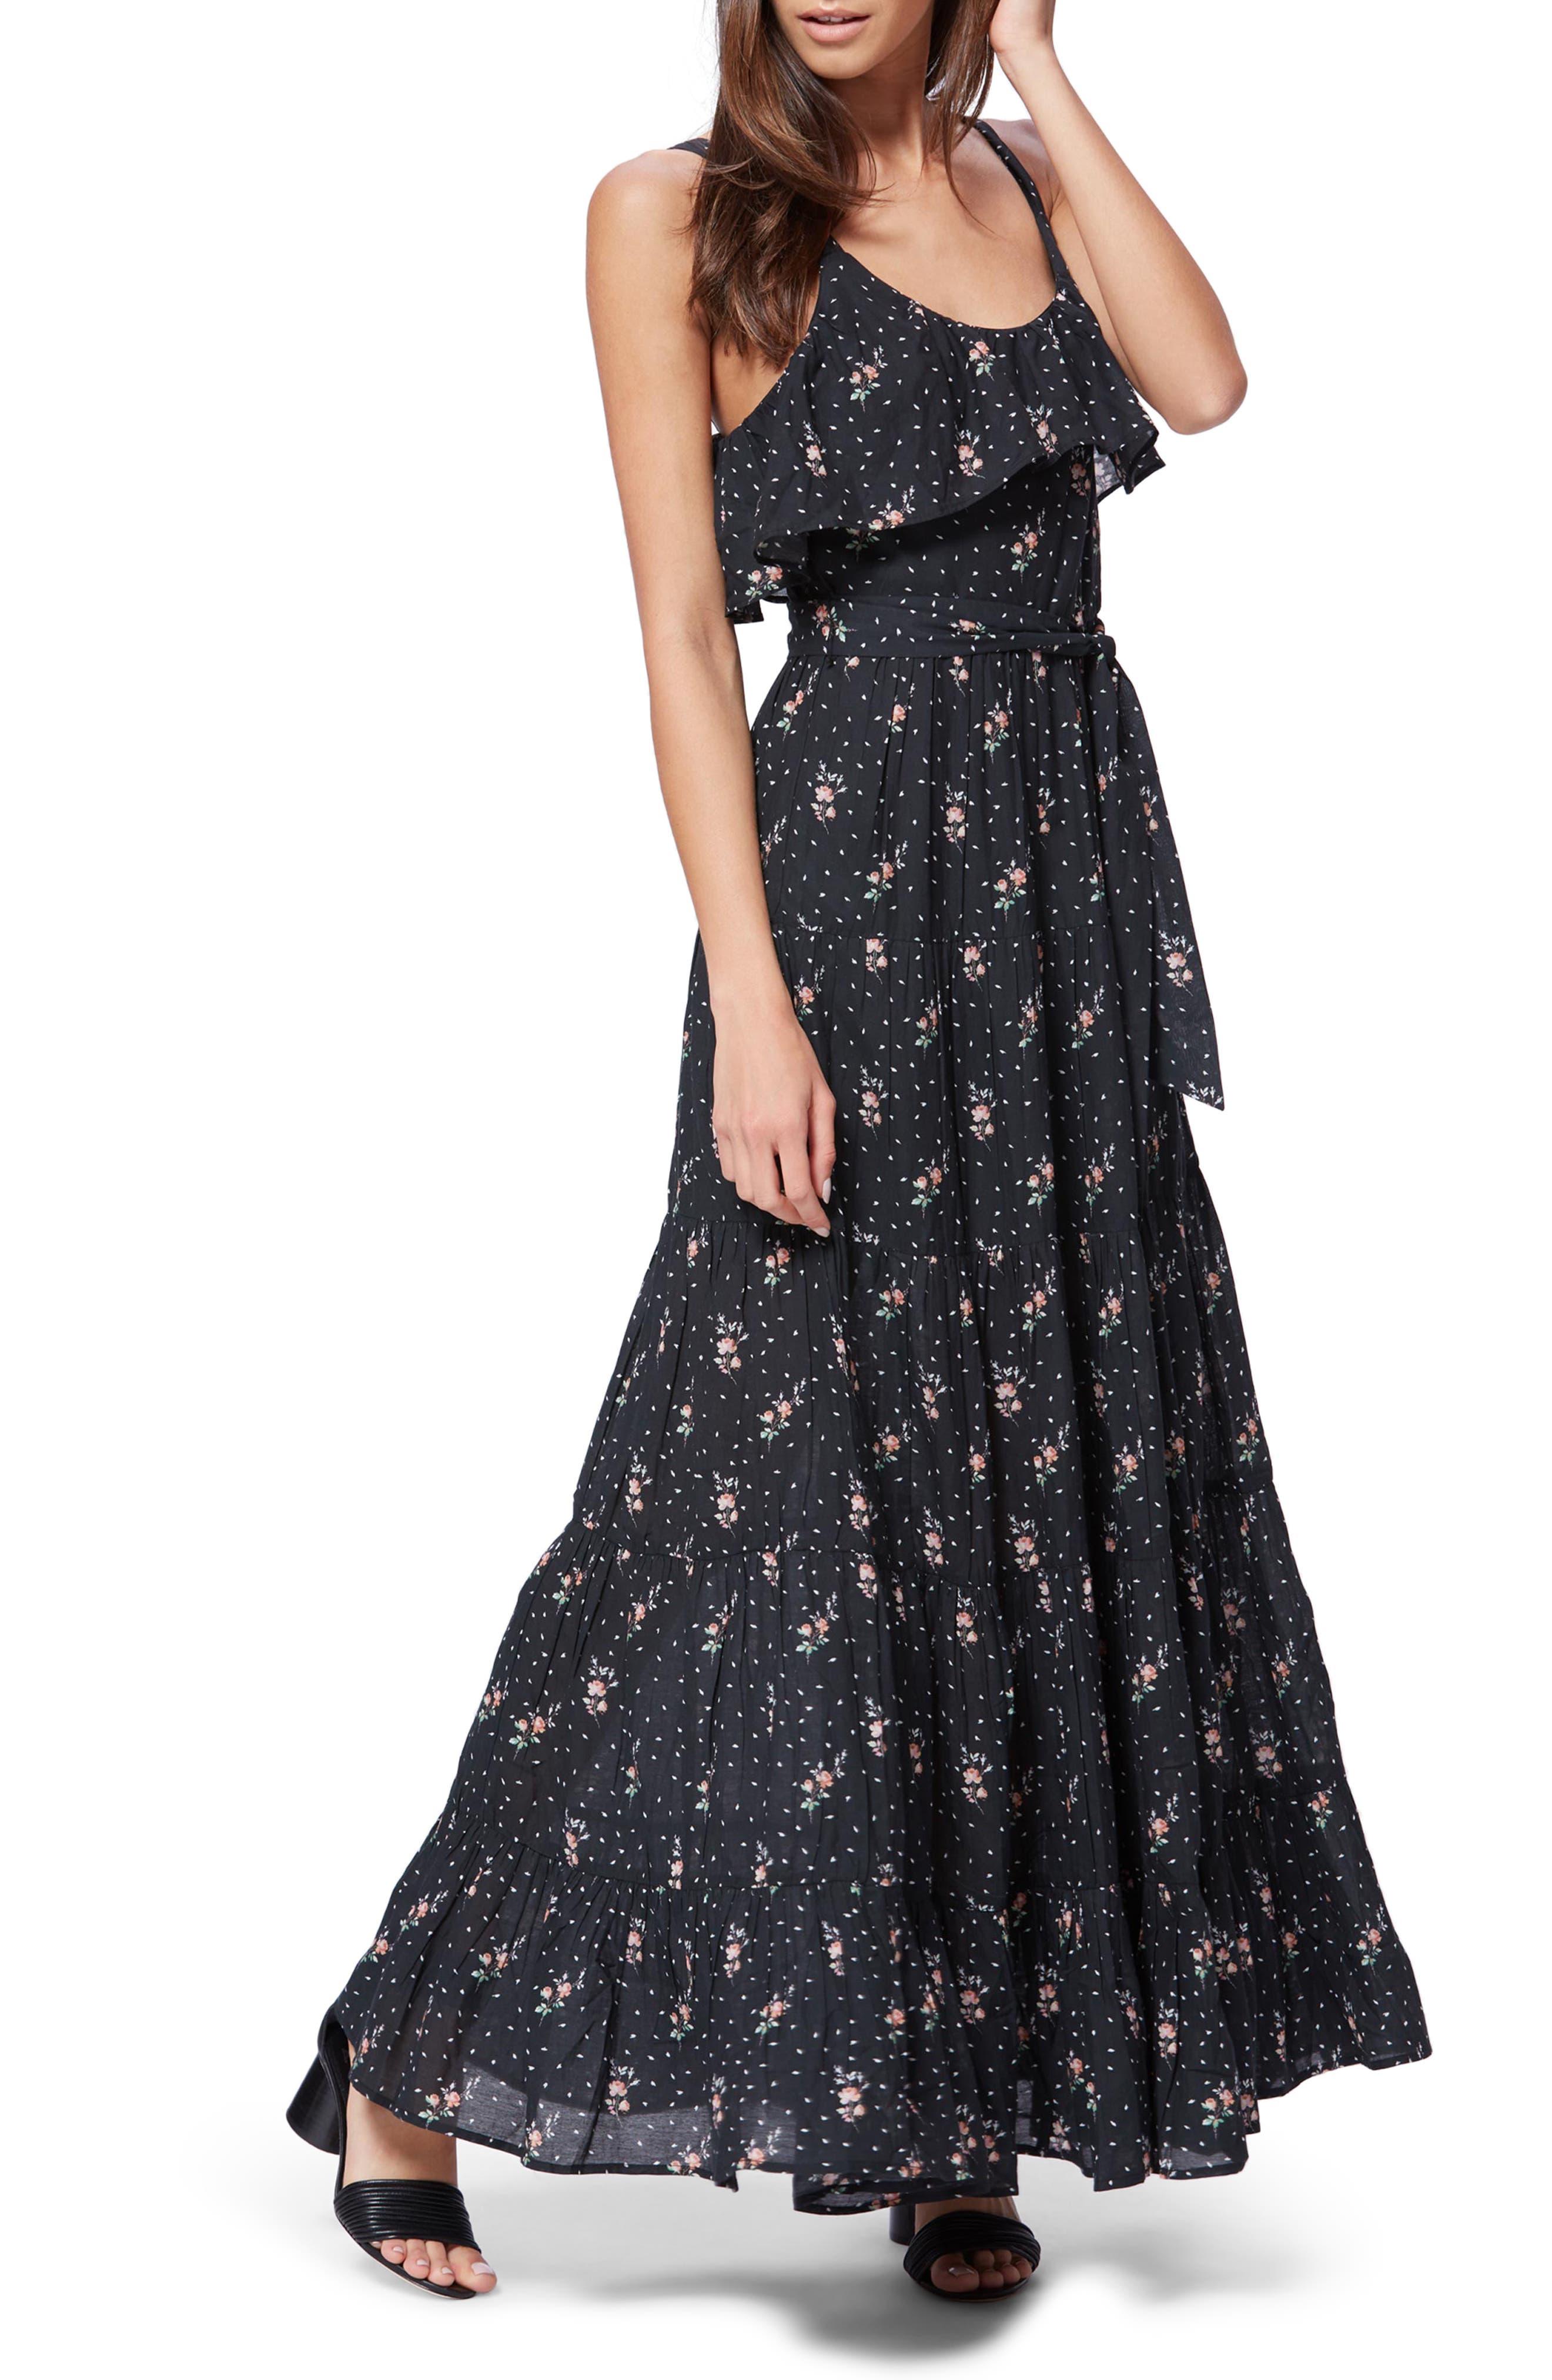 Paige Tevin Maxi Dress, Black